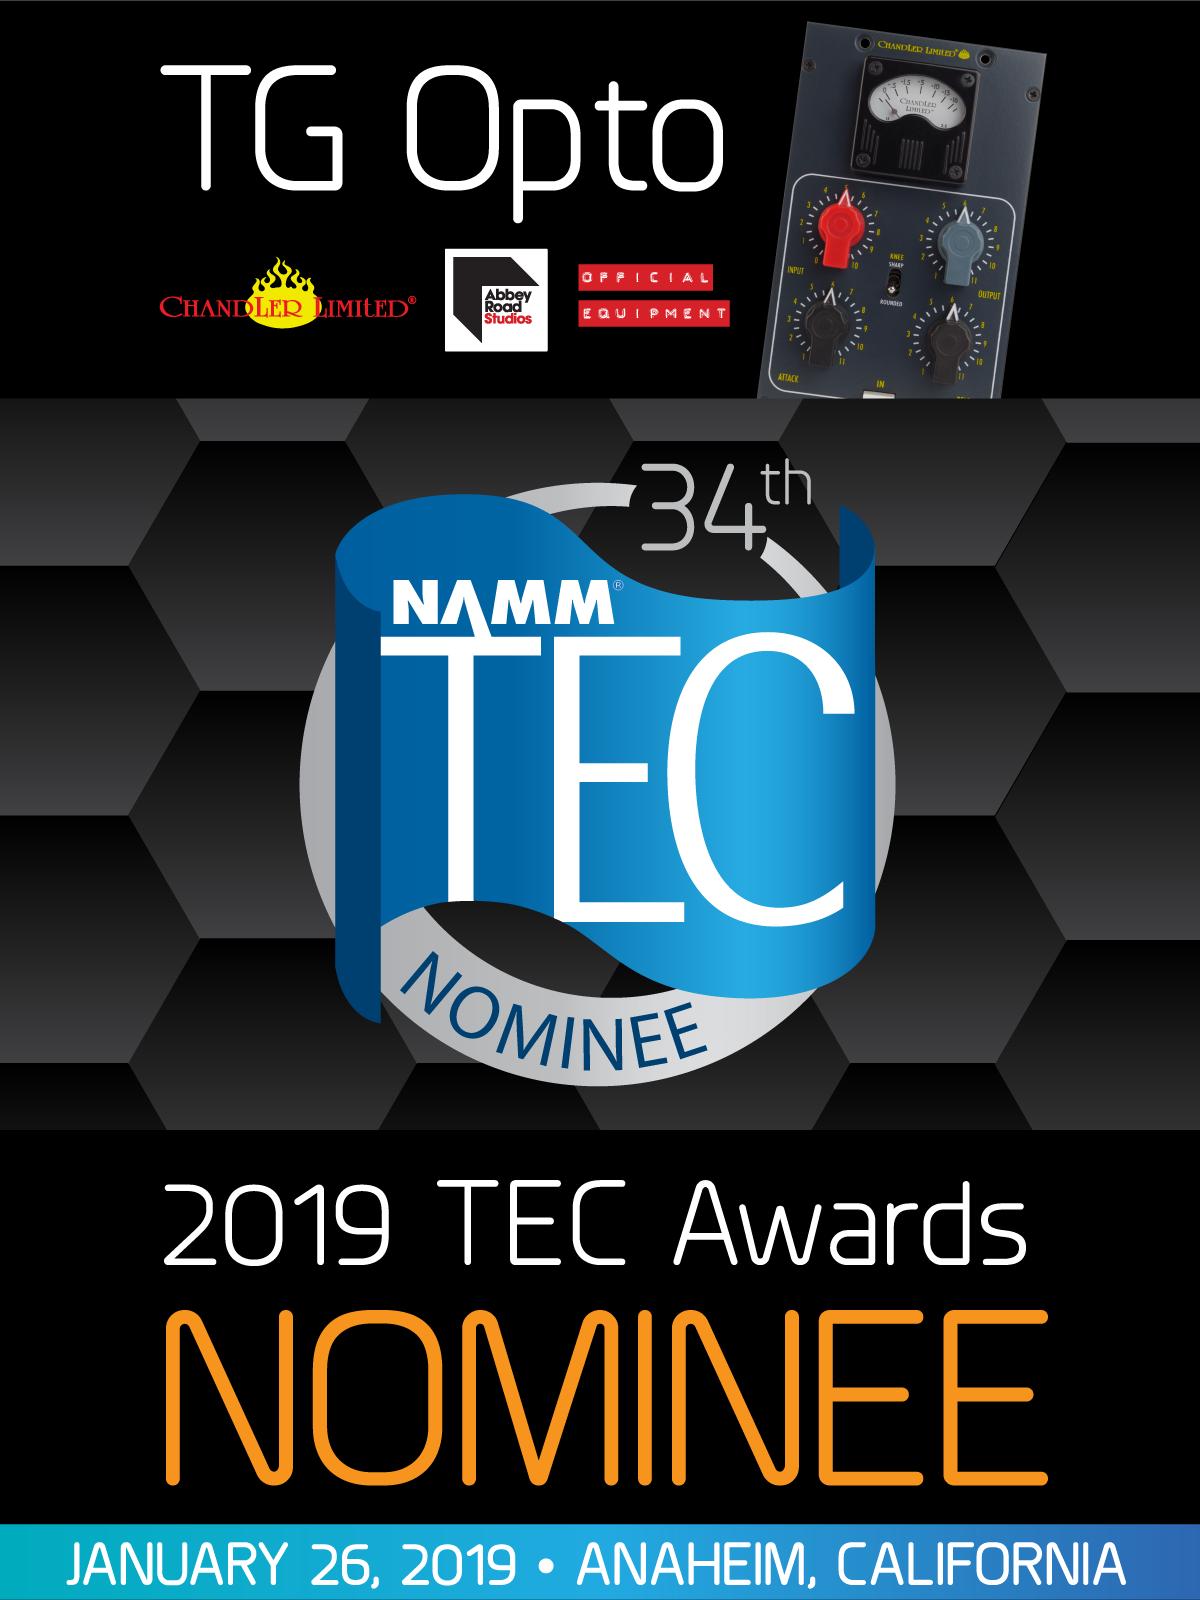 Chandler Limited TG Opto NAMM TEC Awards 34th, EMI Abbey Road Studios